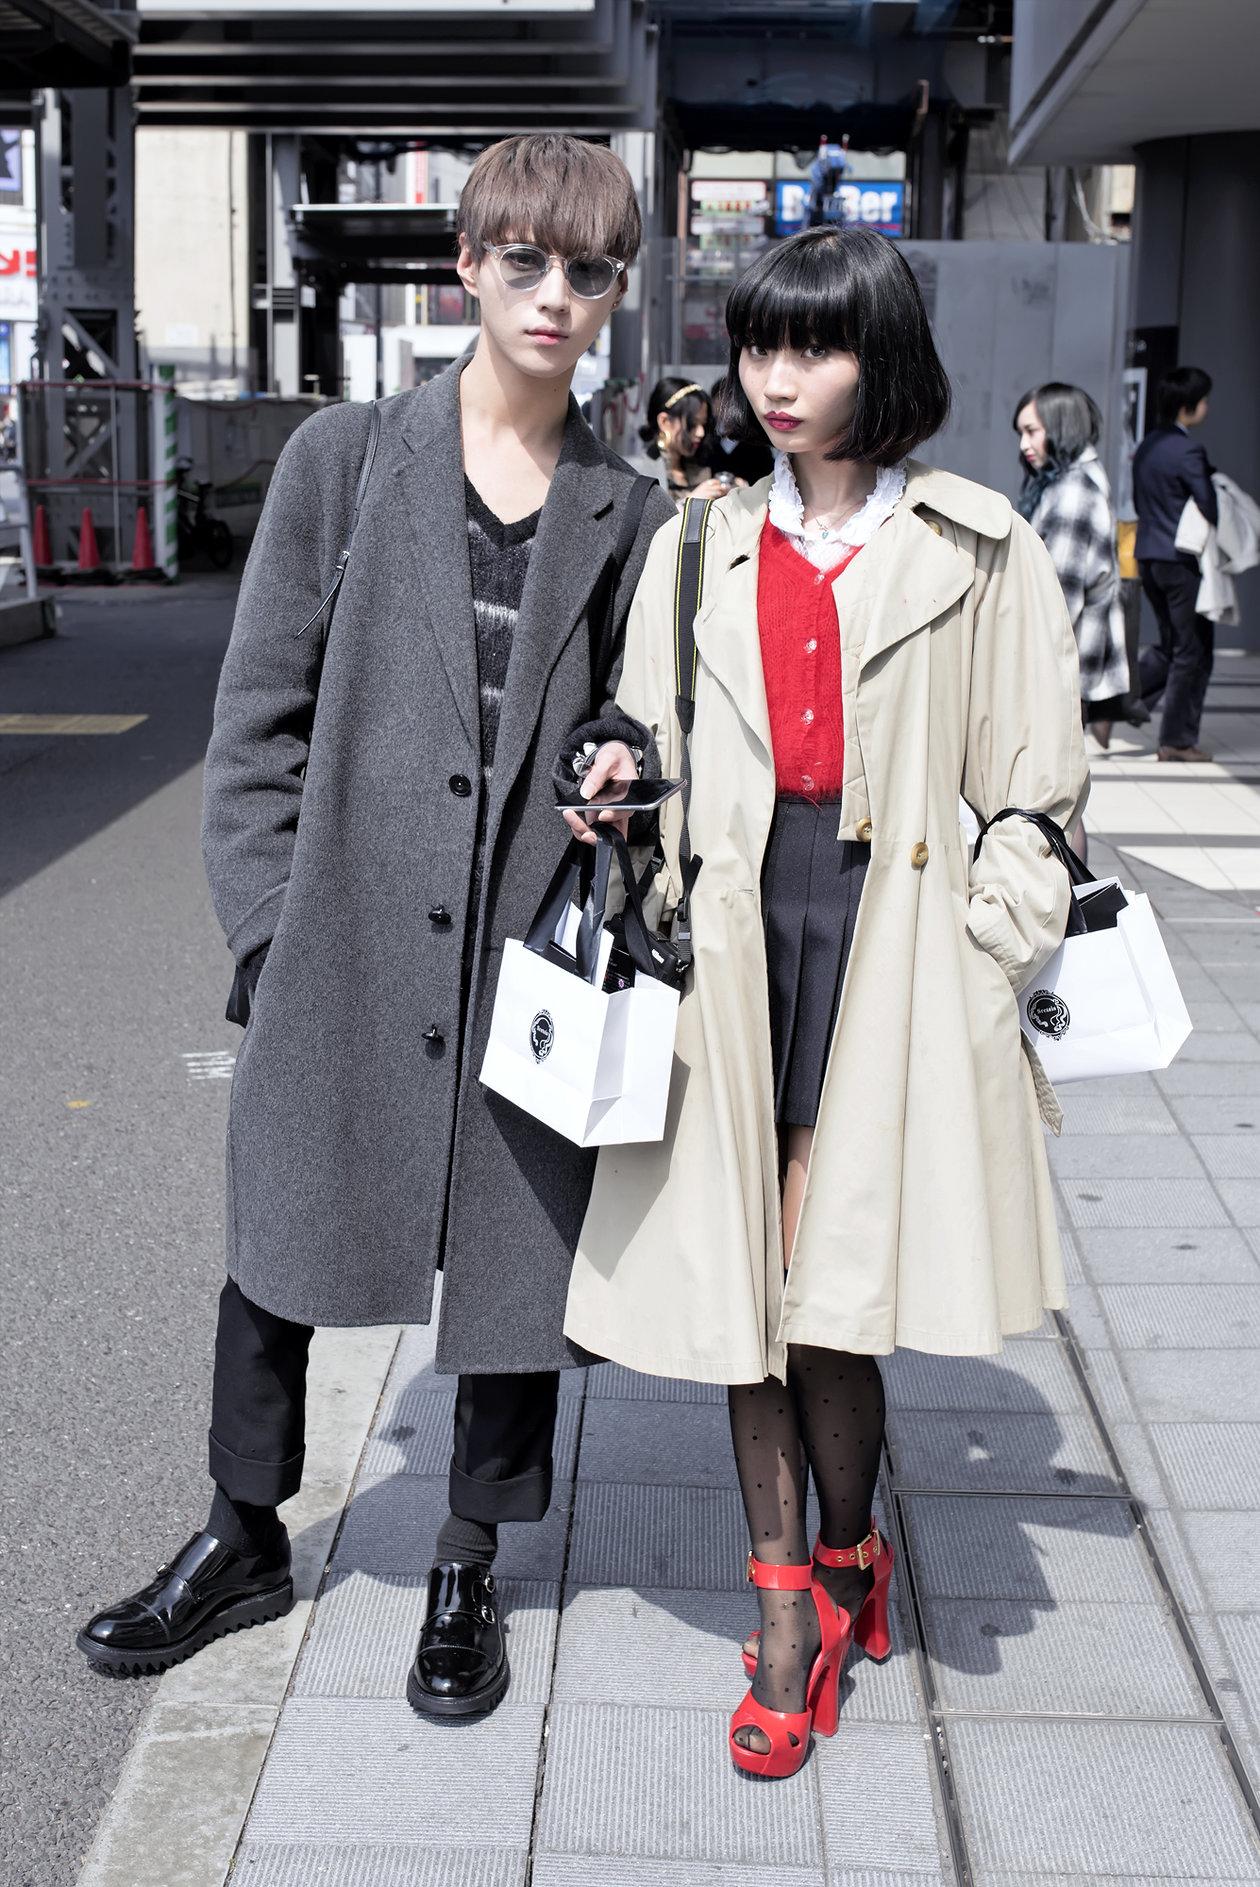 tokyo-fashion-week-street-style-019-